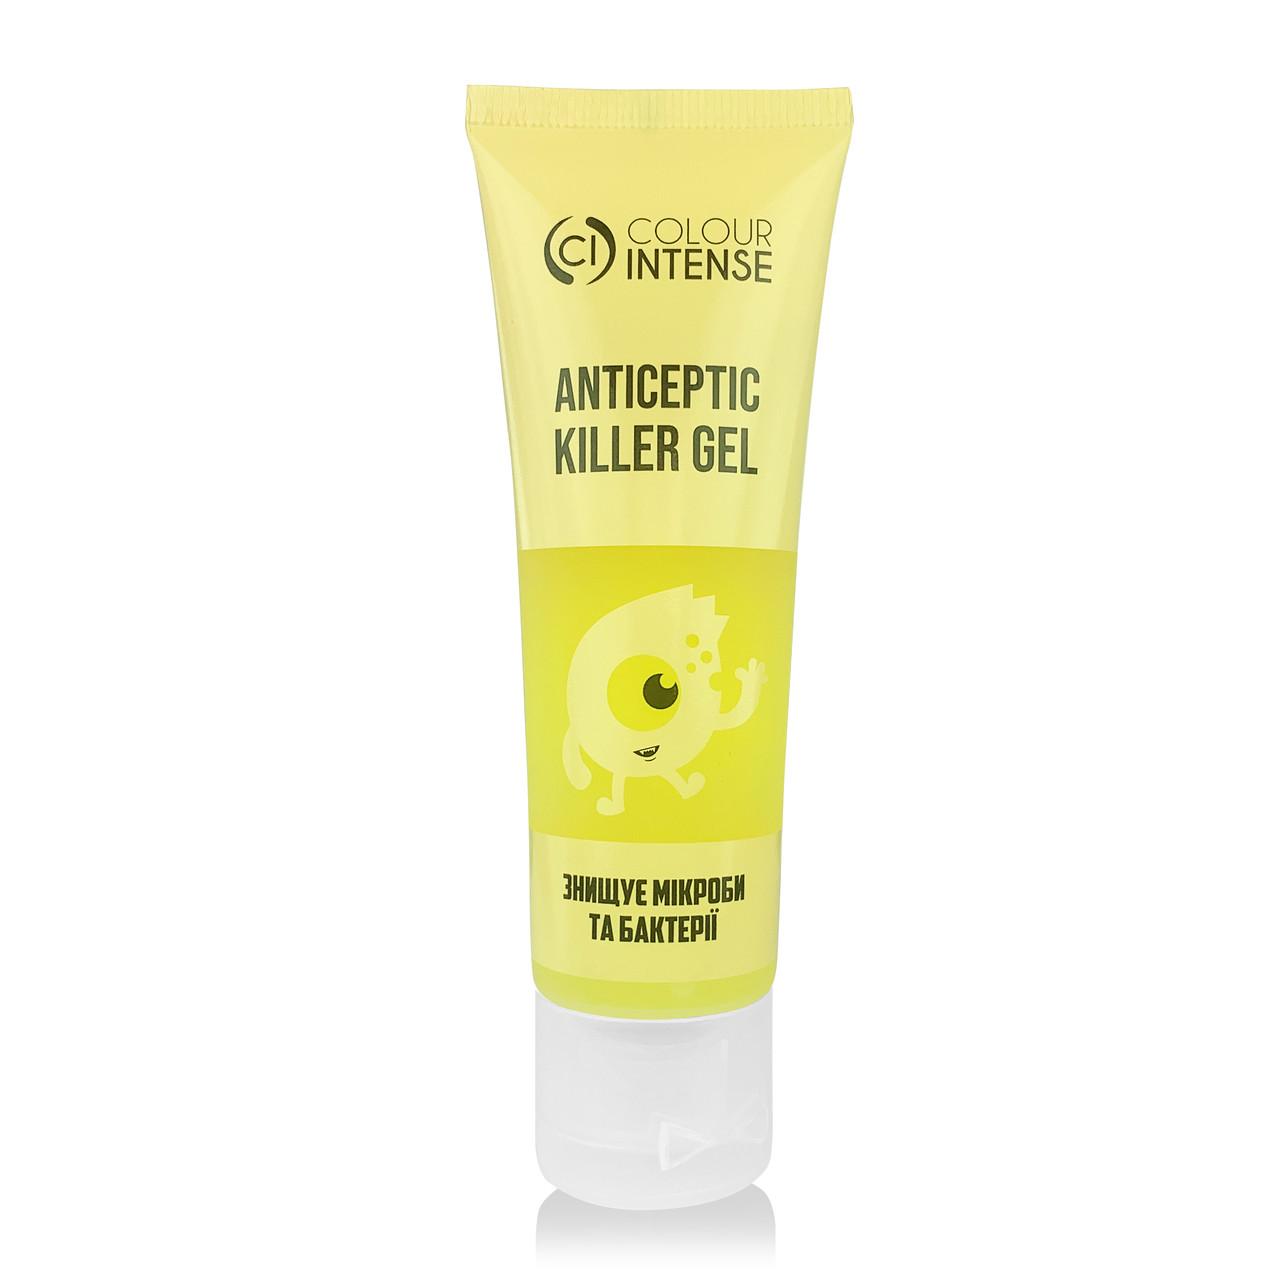 Антисептик-гель для рук Colour Intense Anticeptic Killer Gel citrus